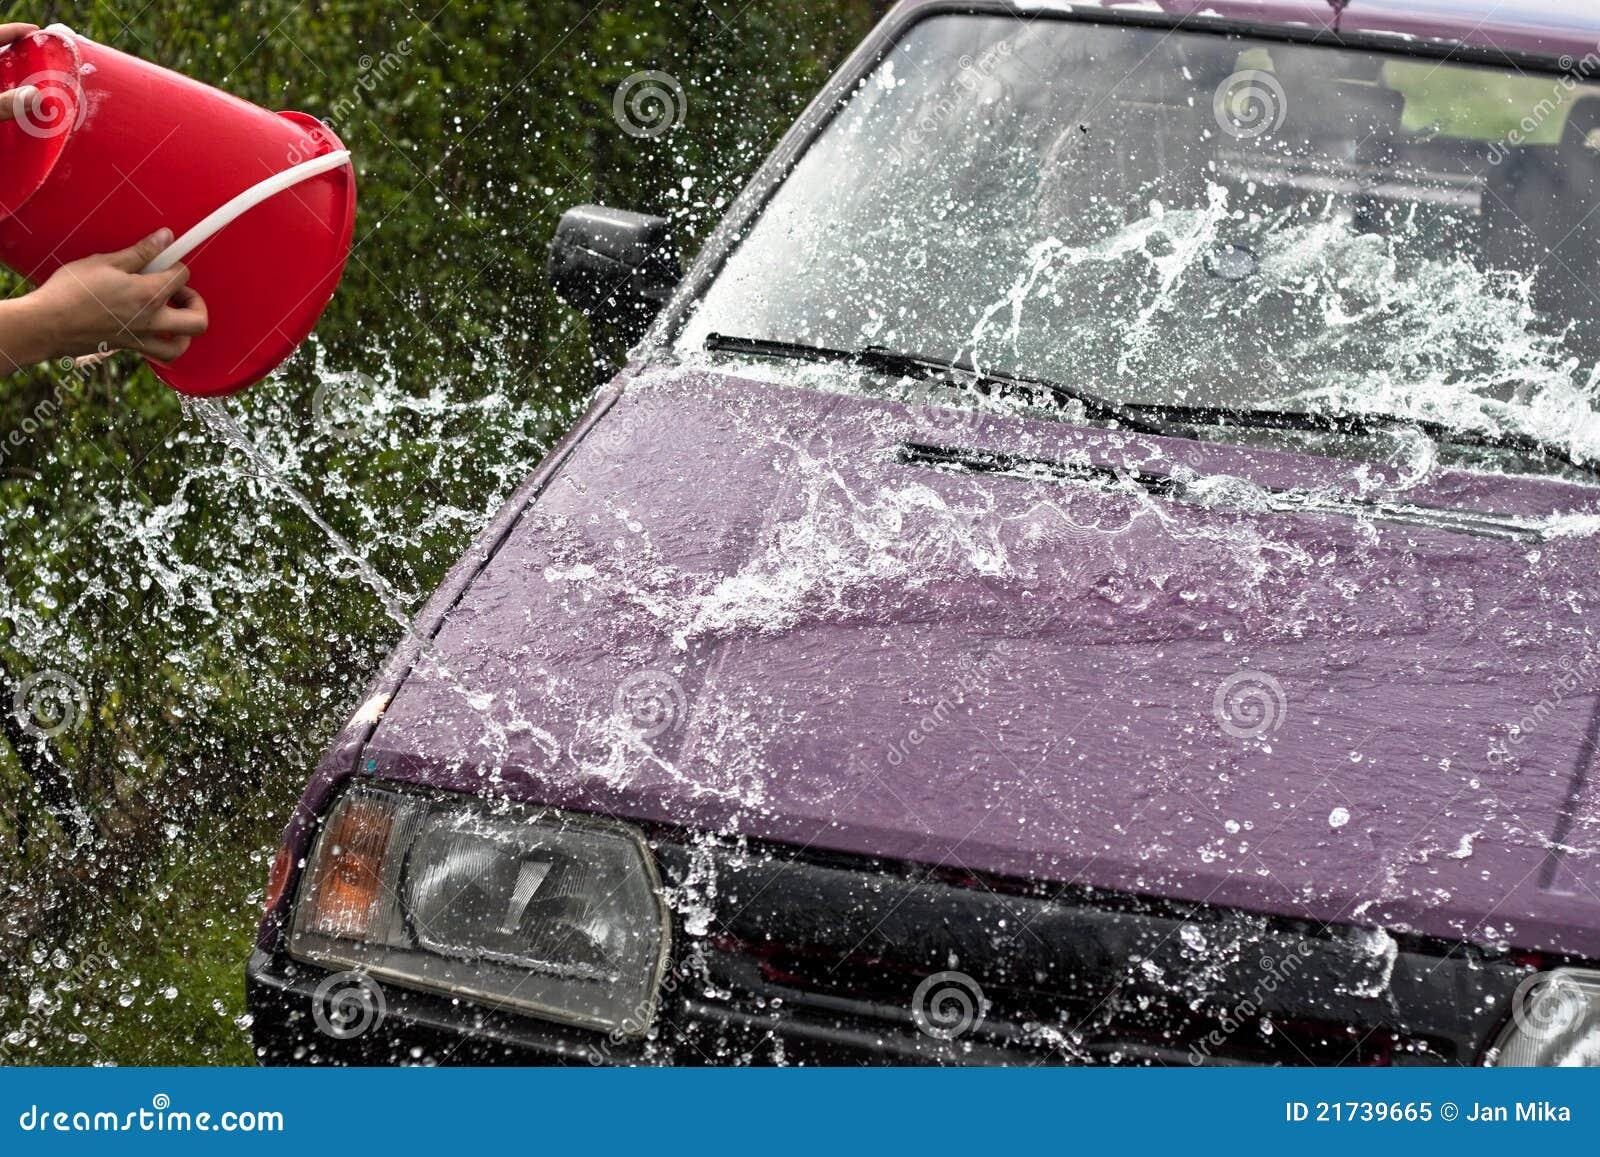 Quick Car Wash >> Quick Car Wash Stock Image Image Of Pail Glass Drop